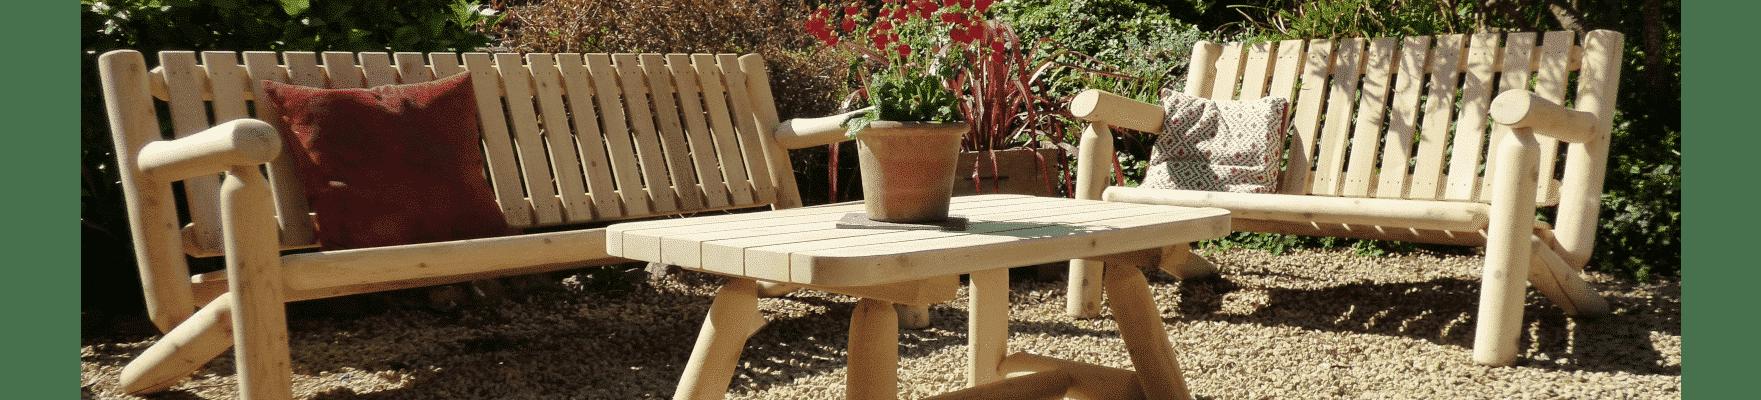 salon bois jardin